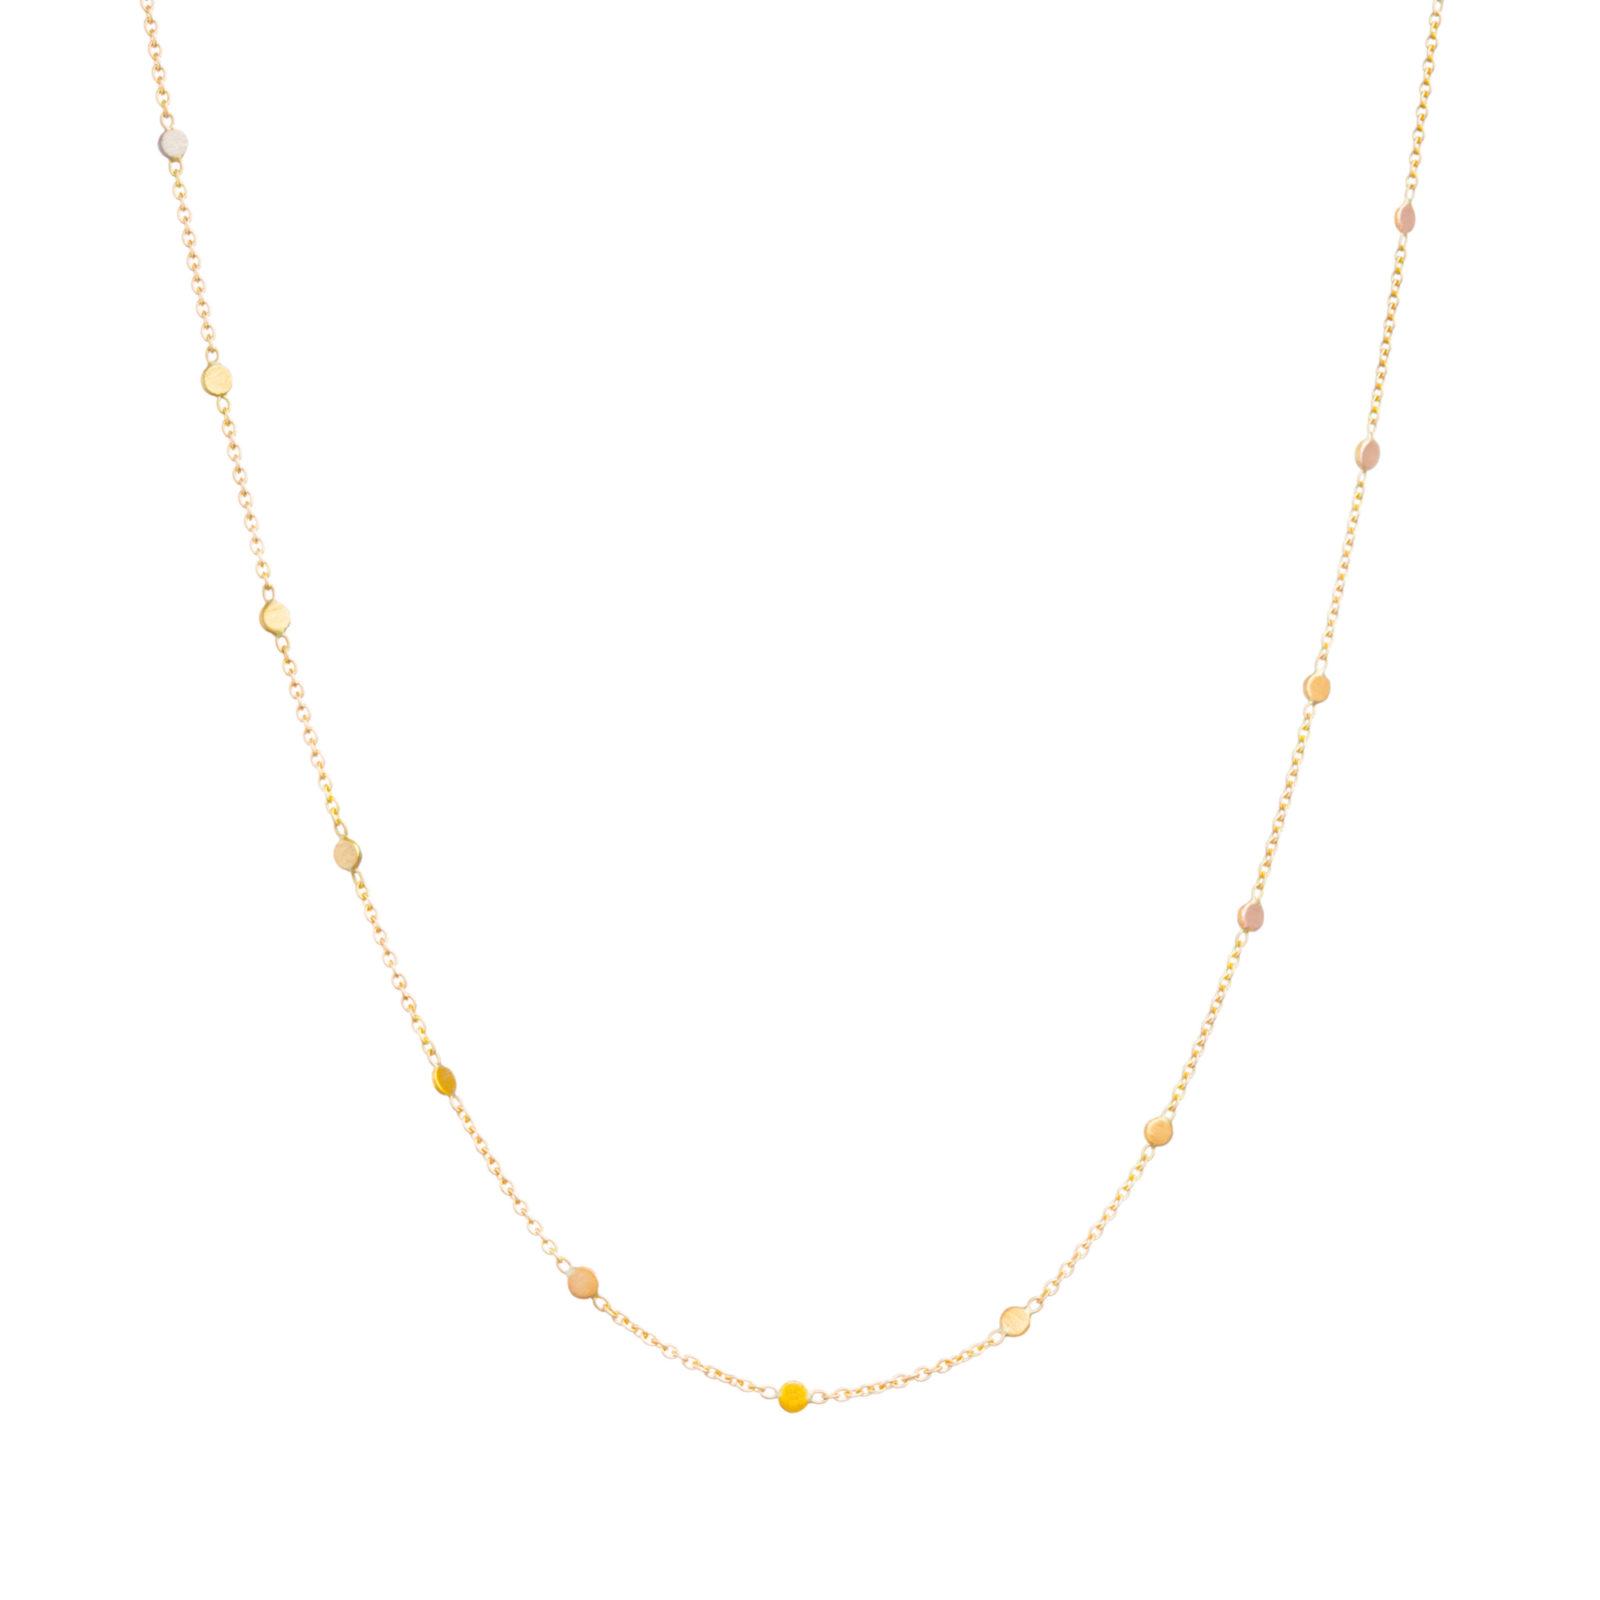 Sia Taylor SN4 RAIN Rainbow Gold Dust Necklace WB